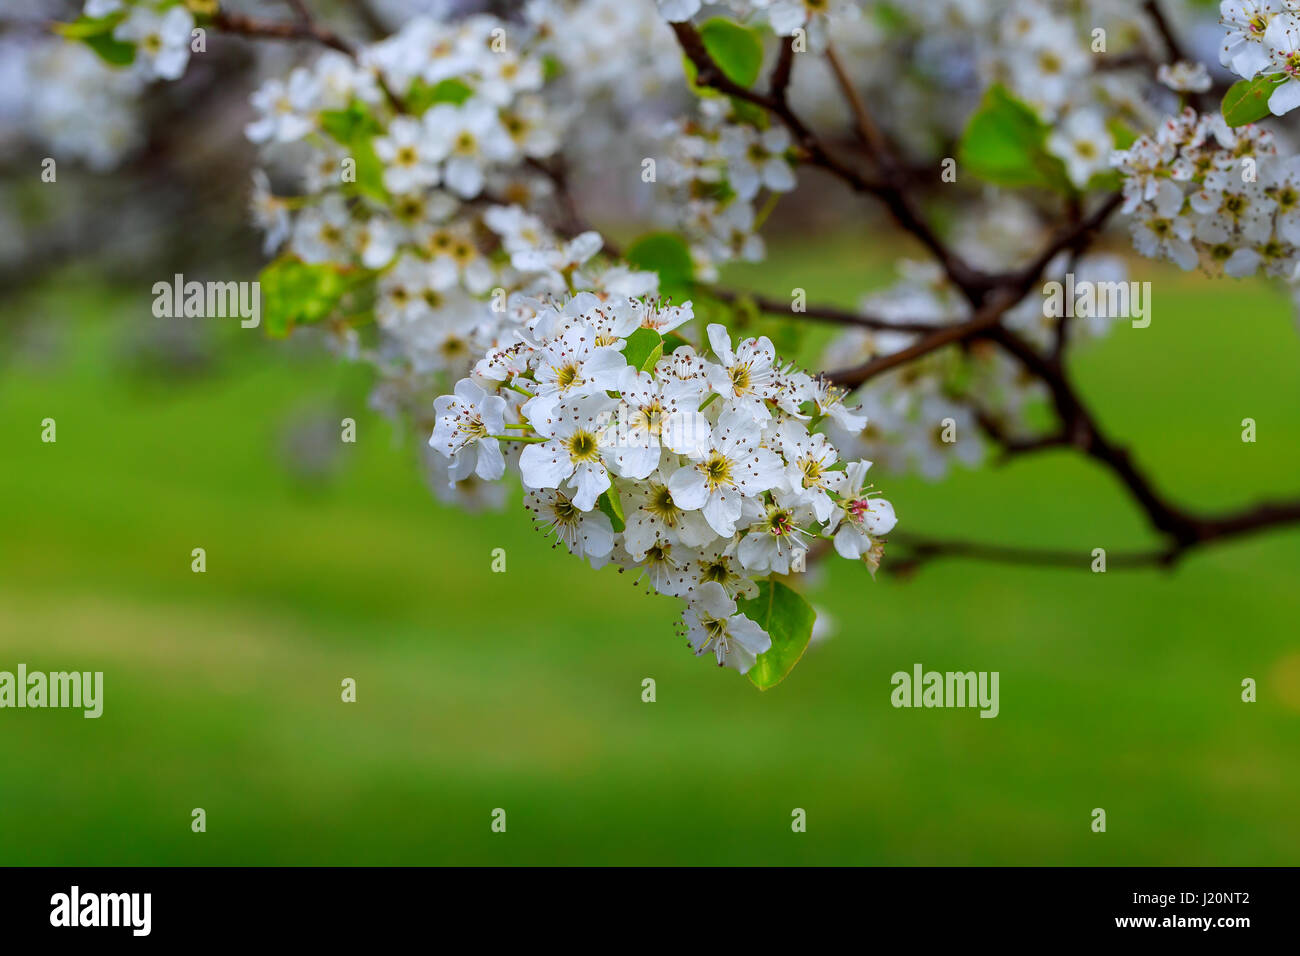 Blossoming Cherry Prunus avium , Ukraine, Eastern Europe Springtime season. Beautifully blossoming tree - Stock Image